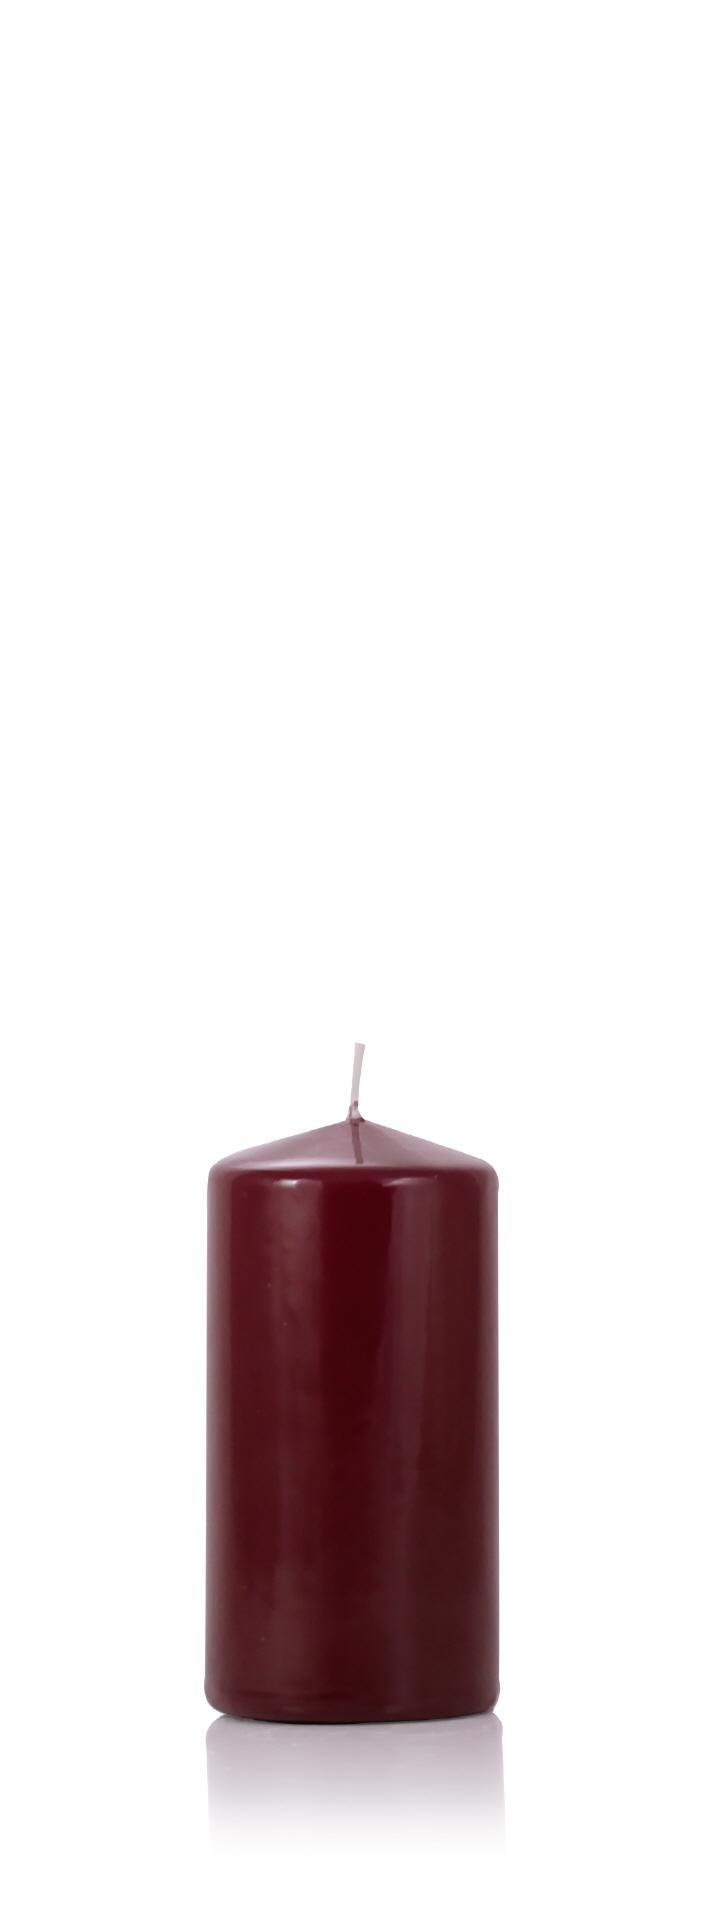 lackkerze hochglanz bordeaux 120 x 60 mm im kerzen shop zu guenstigen preisen kaufen. Black Bedroom Furniture Sets. Home Design Ideas